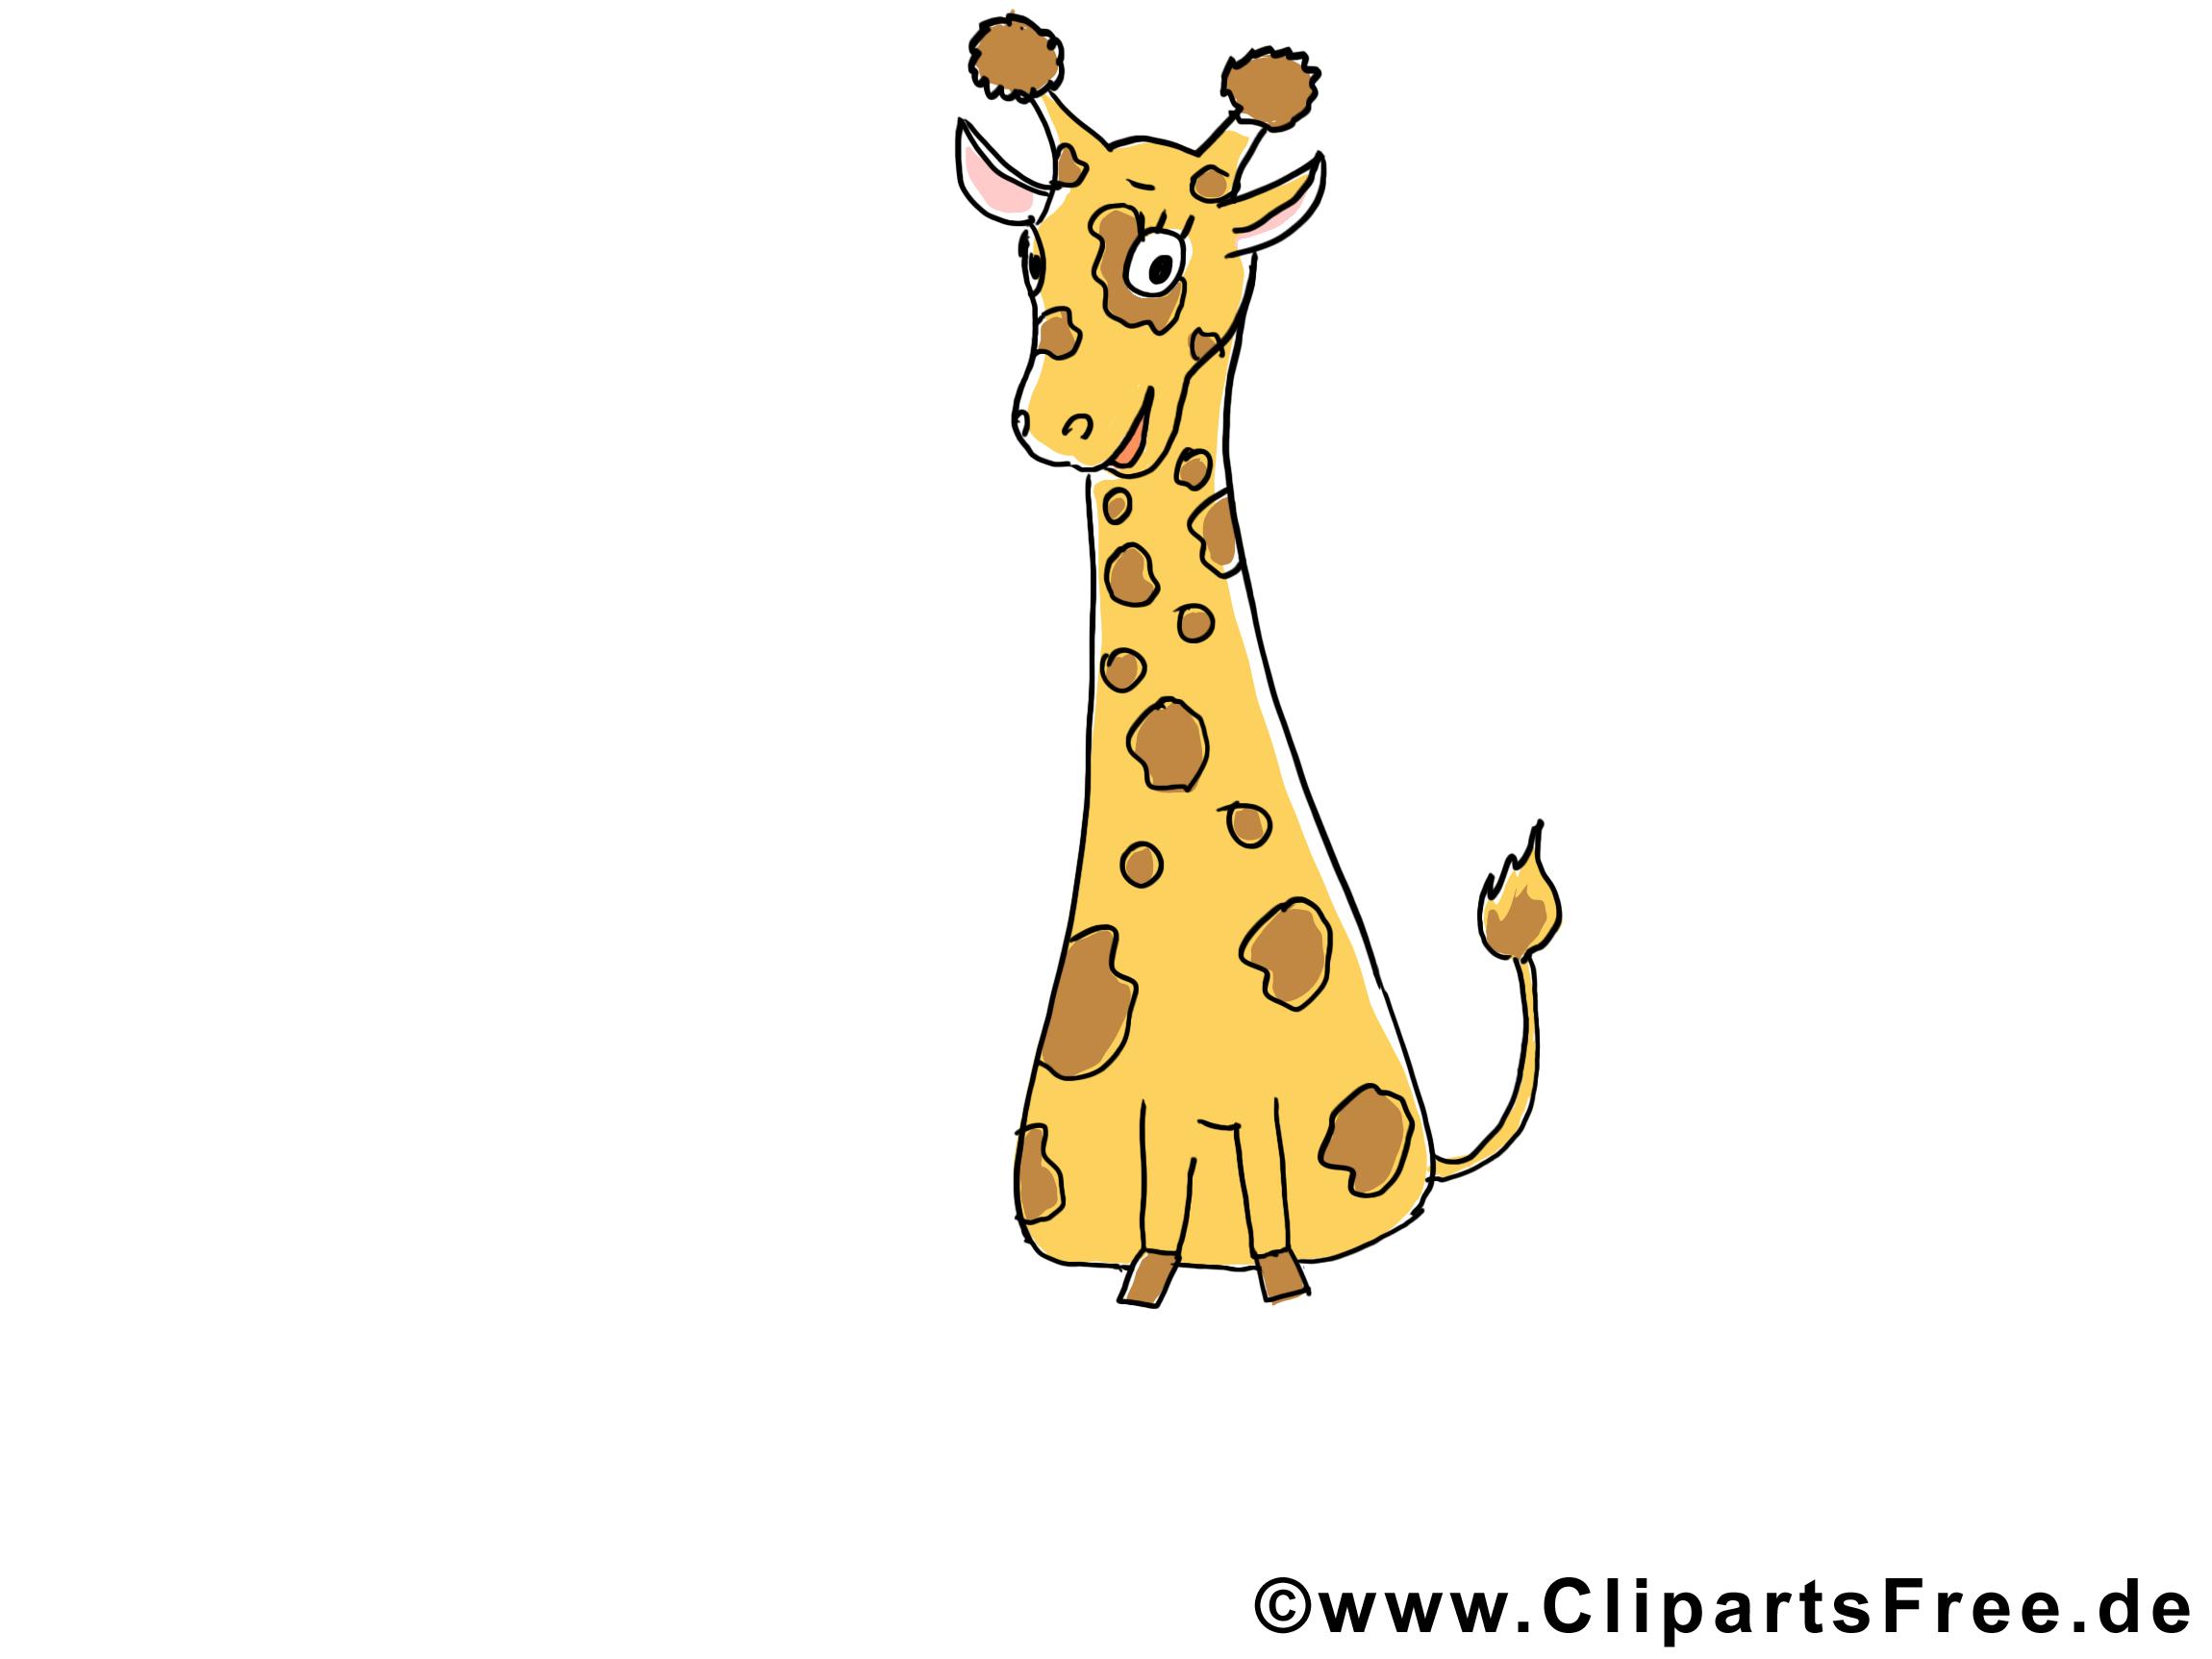 Girafe image gratuite – Animal illustration